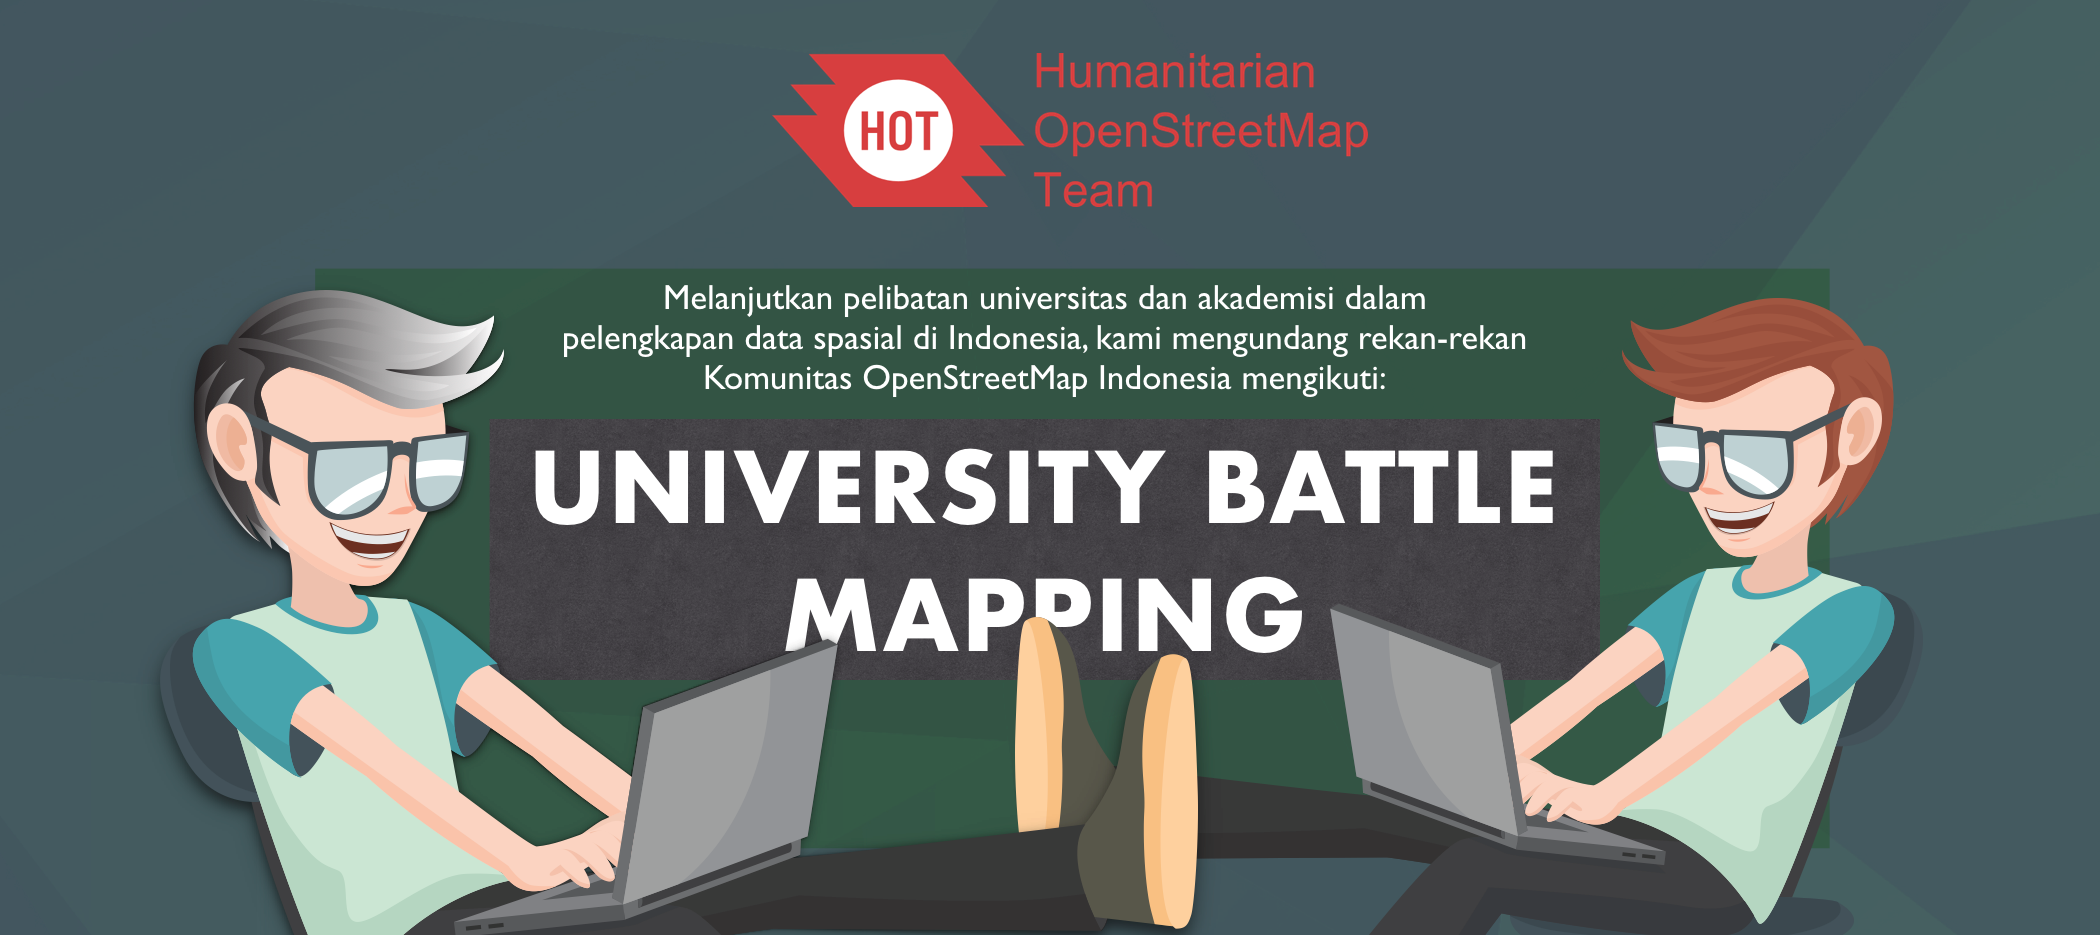 University Battle Mapping 2017   OpenStreetMap Indonesia